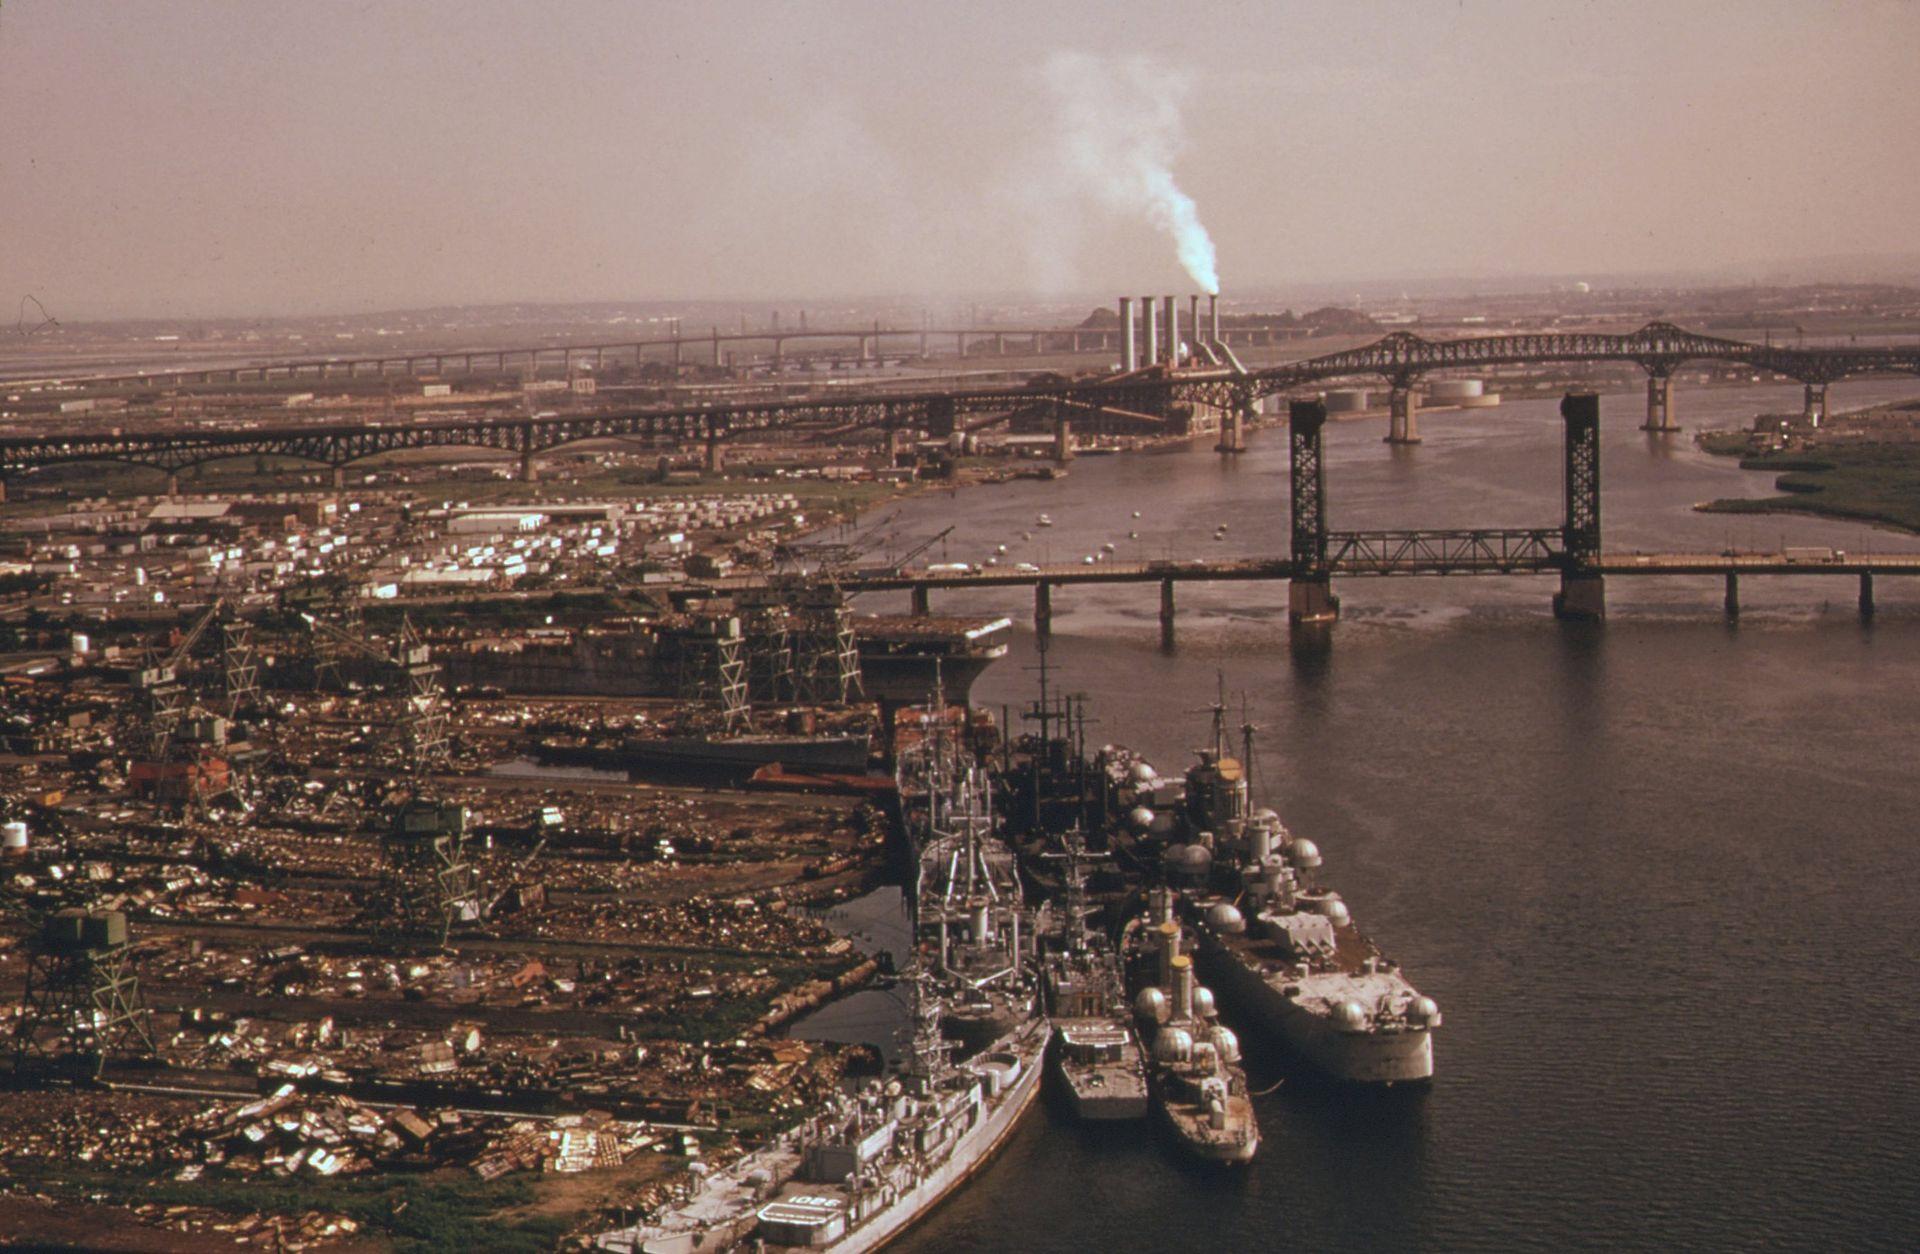 Federal Shipbuilding & Drydock Company